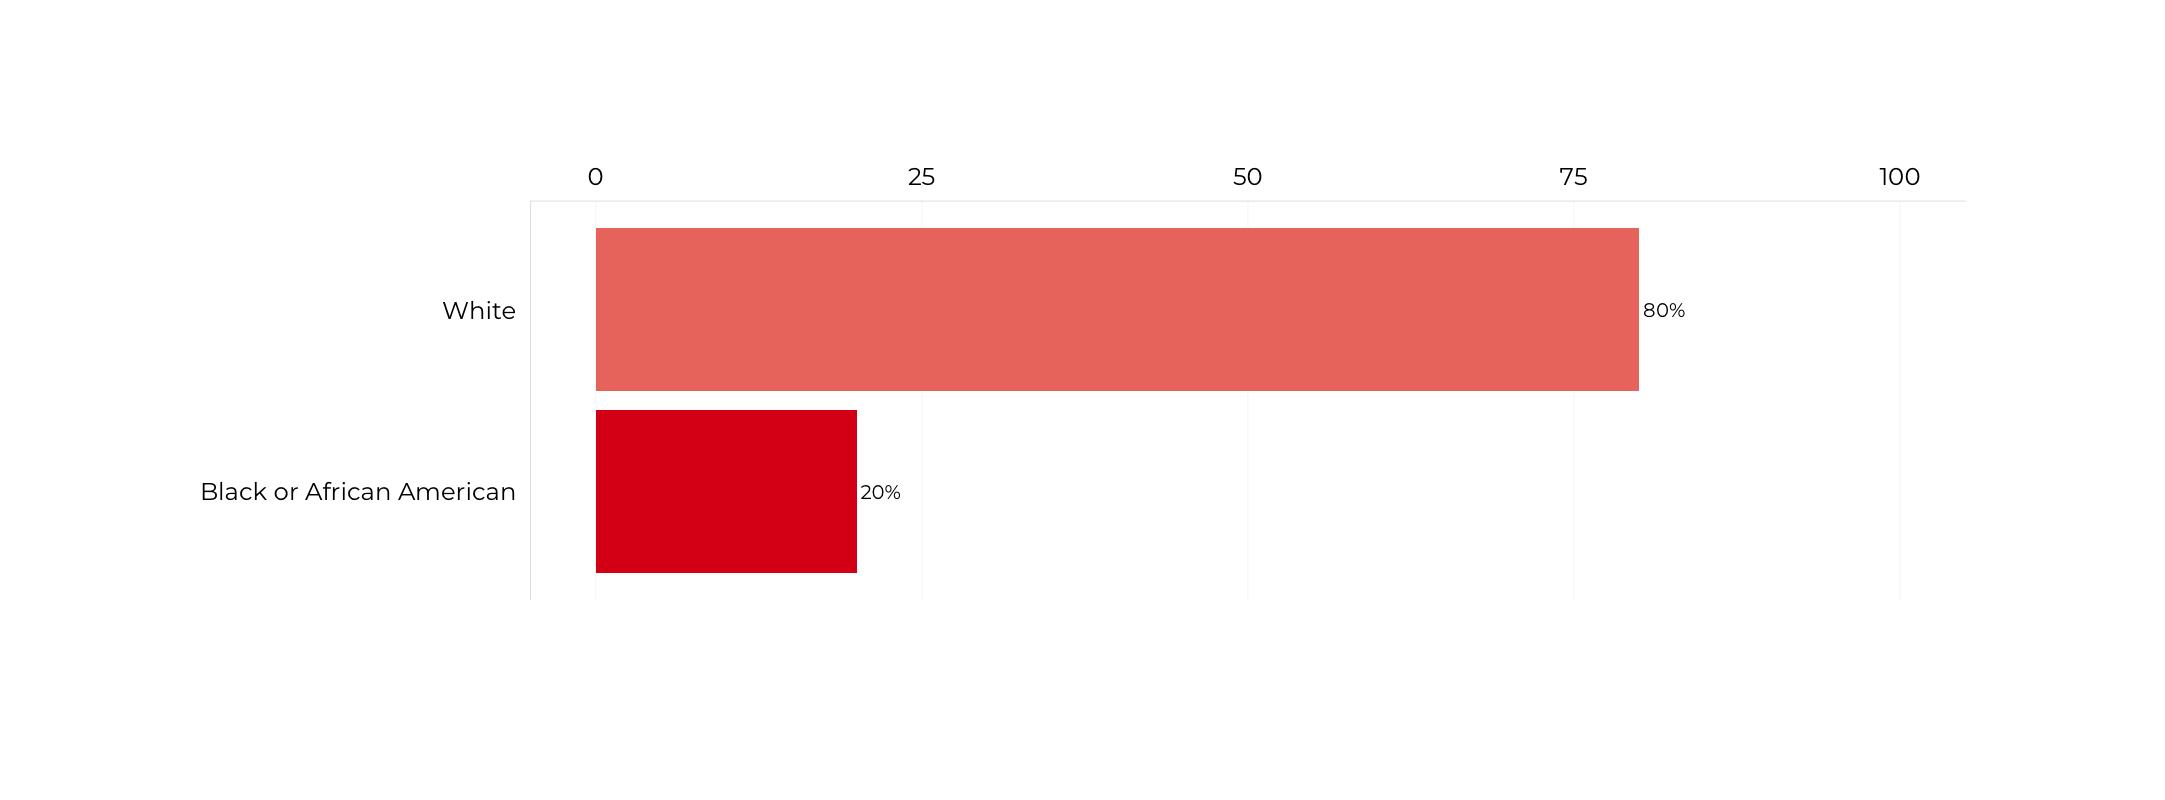 Graph about Racial Composition of Deputy Secretaries of Education. More detailed text description below.